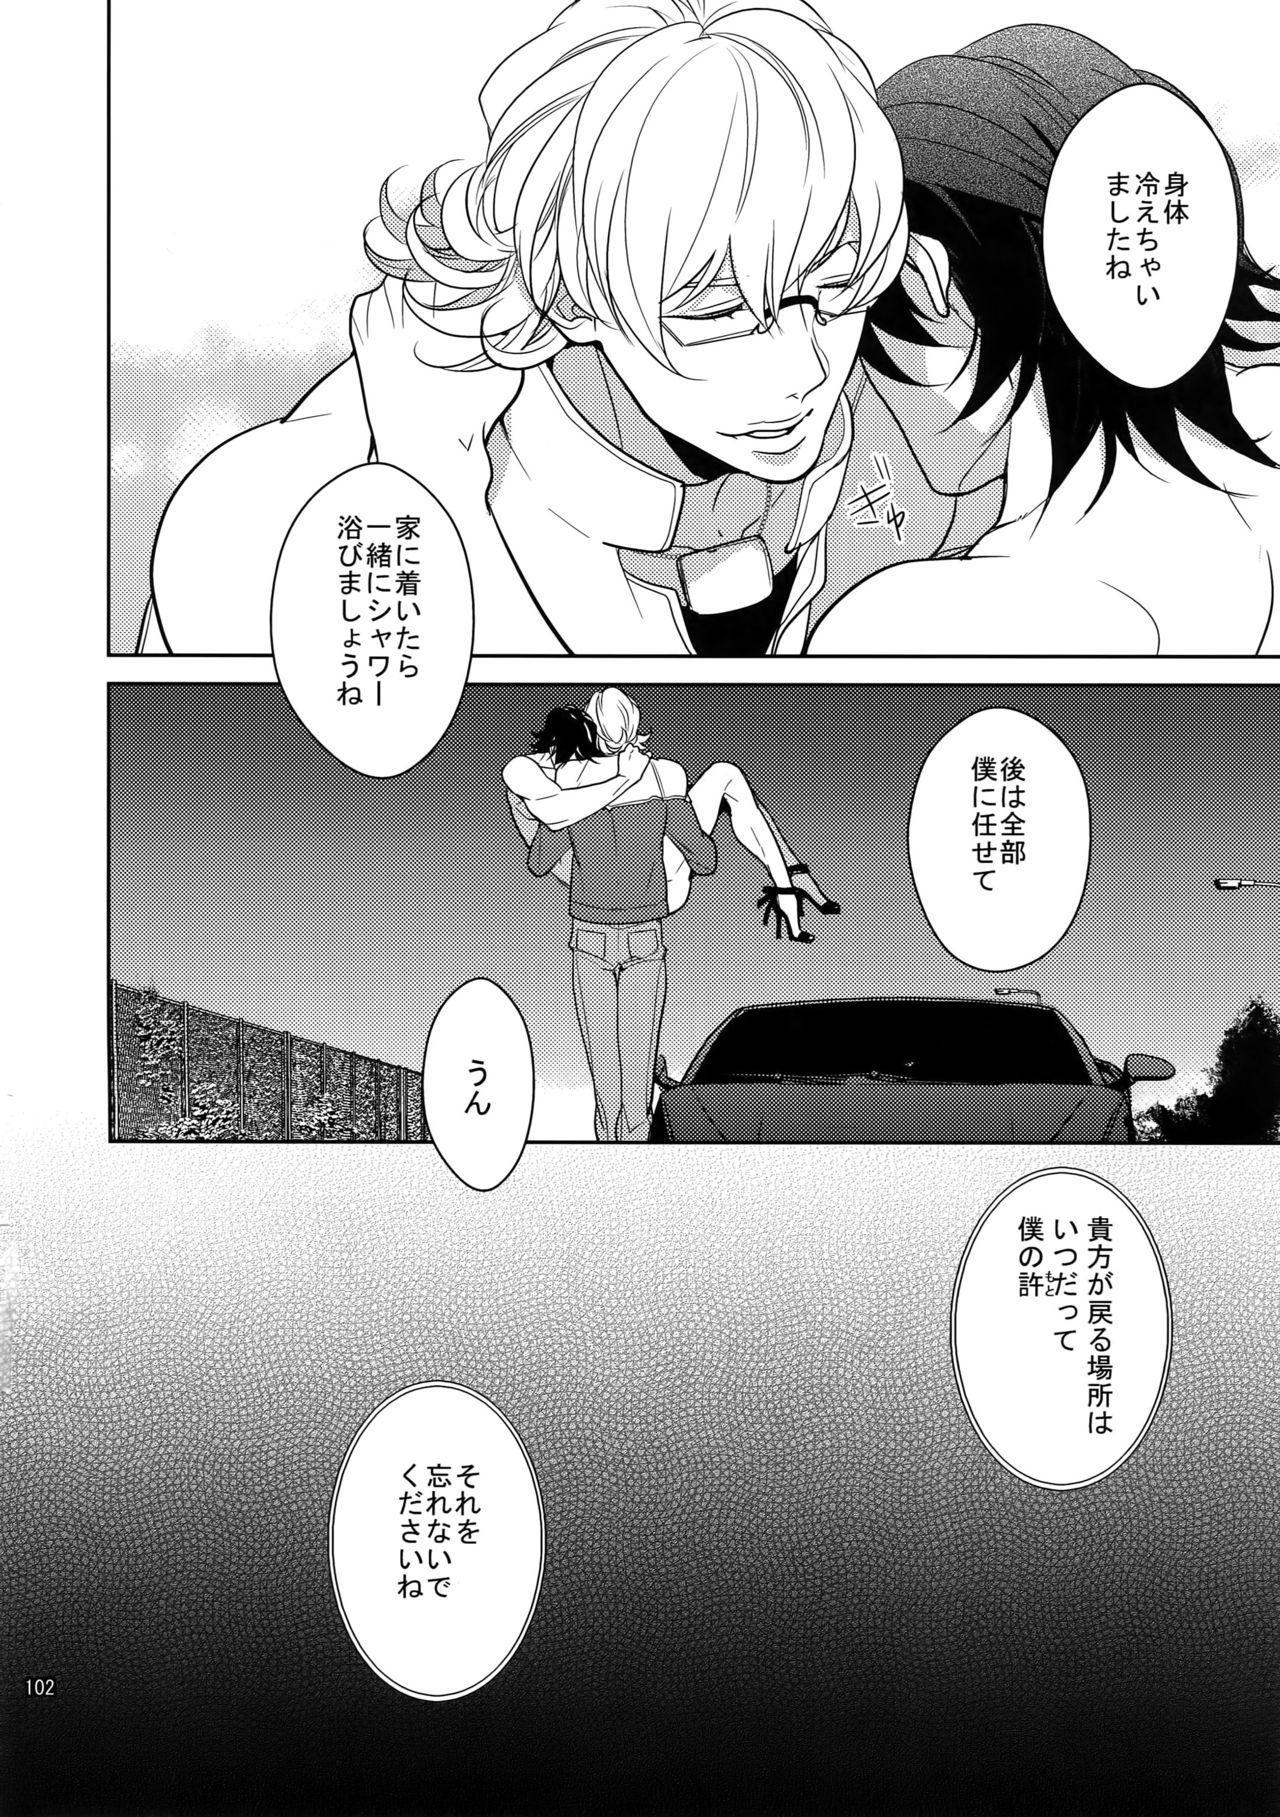 BOROZS Usagi Tora Sairoku 2 100